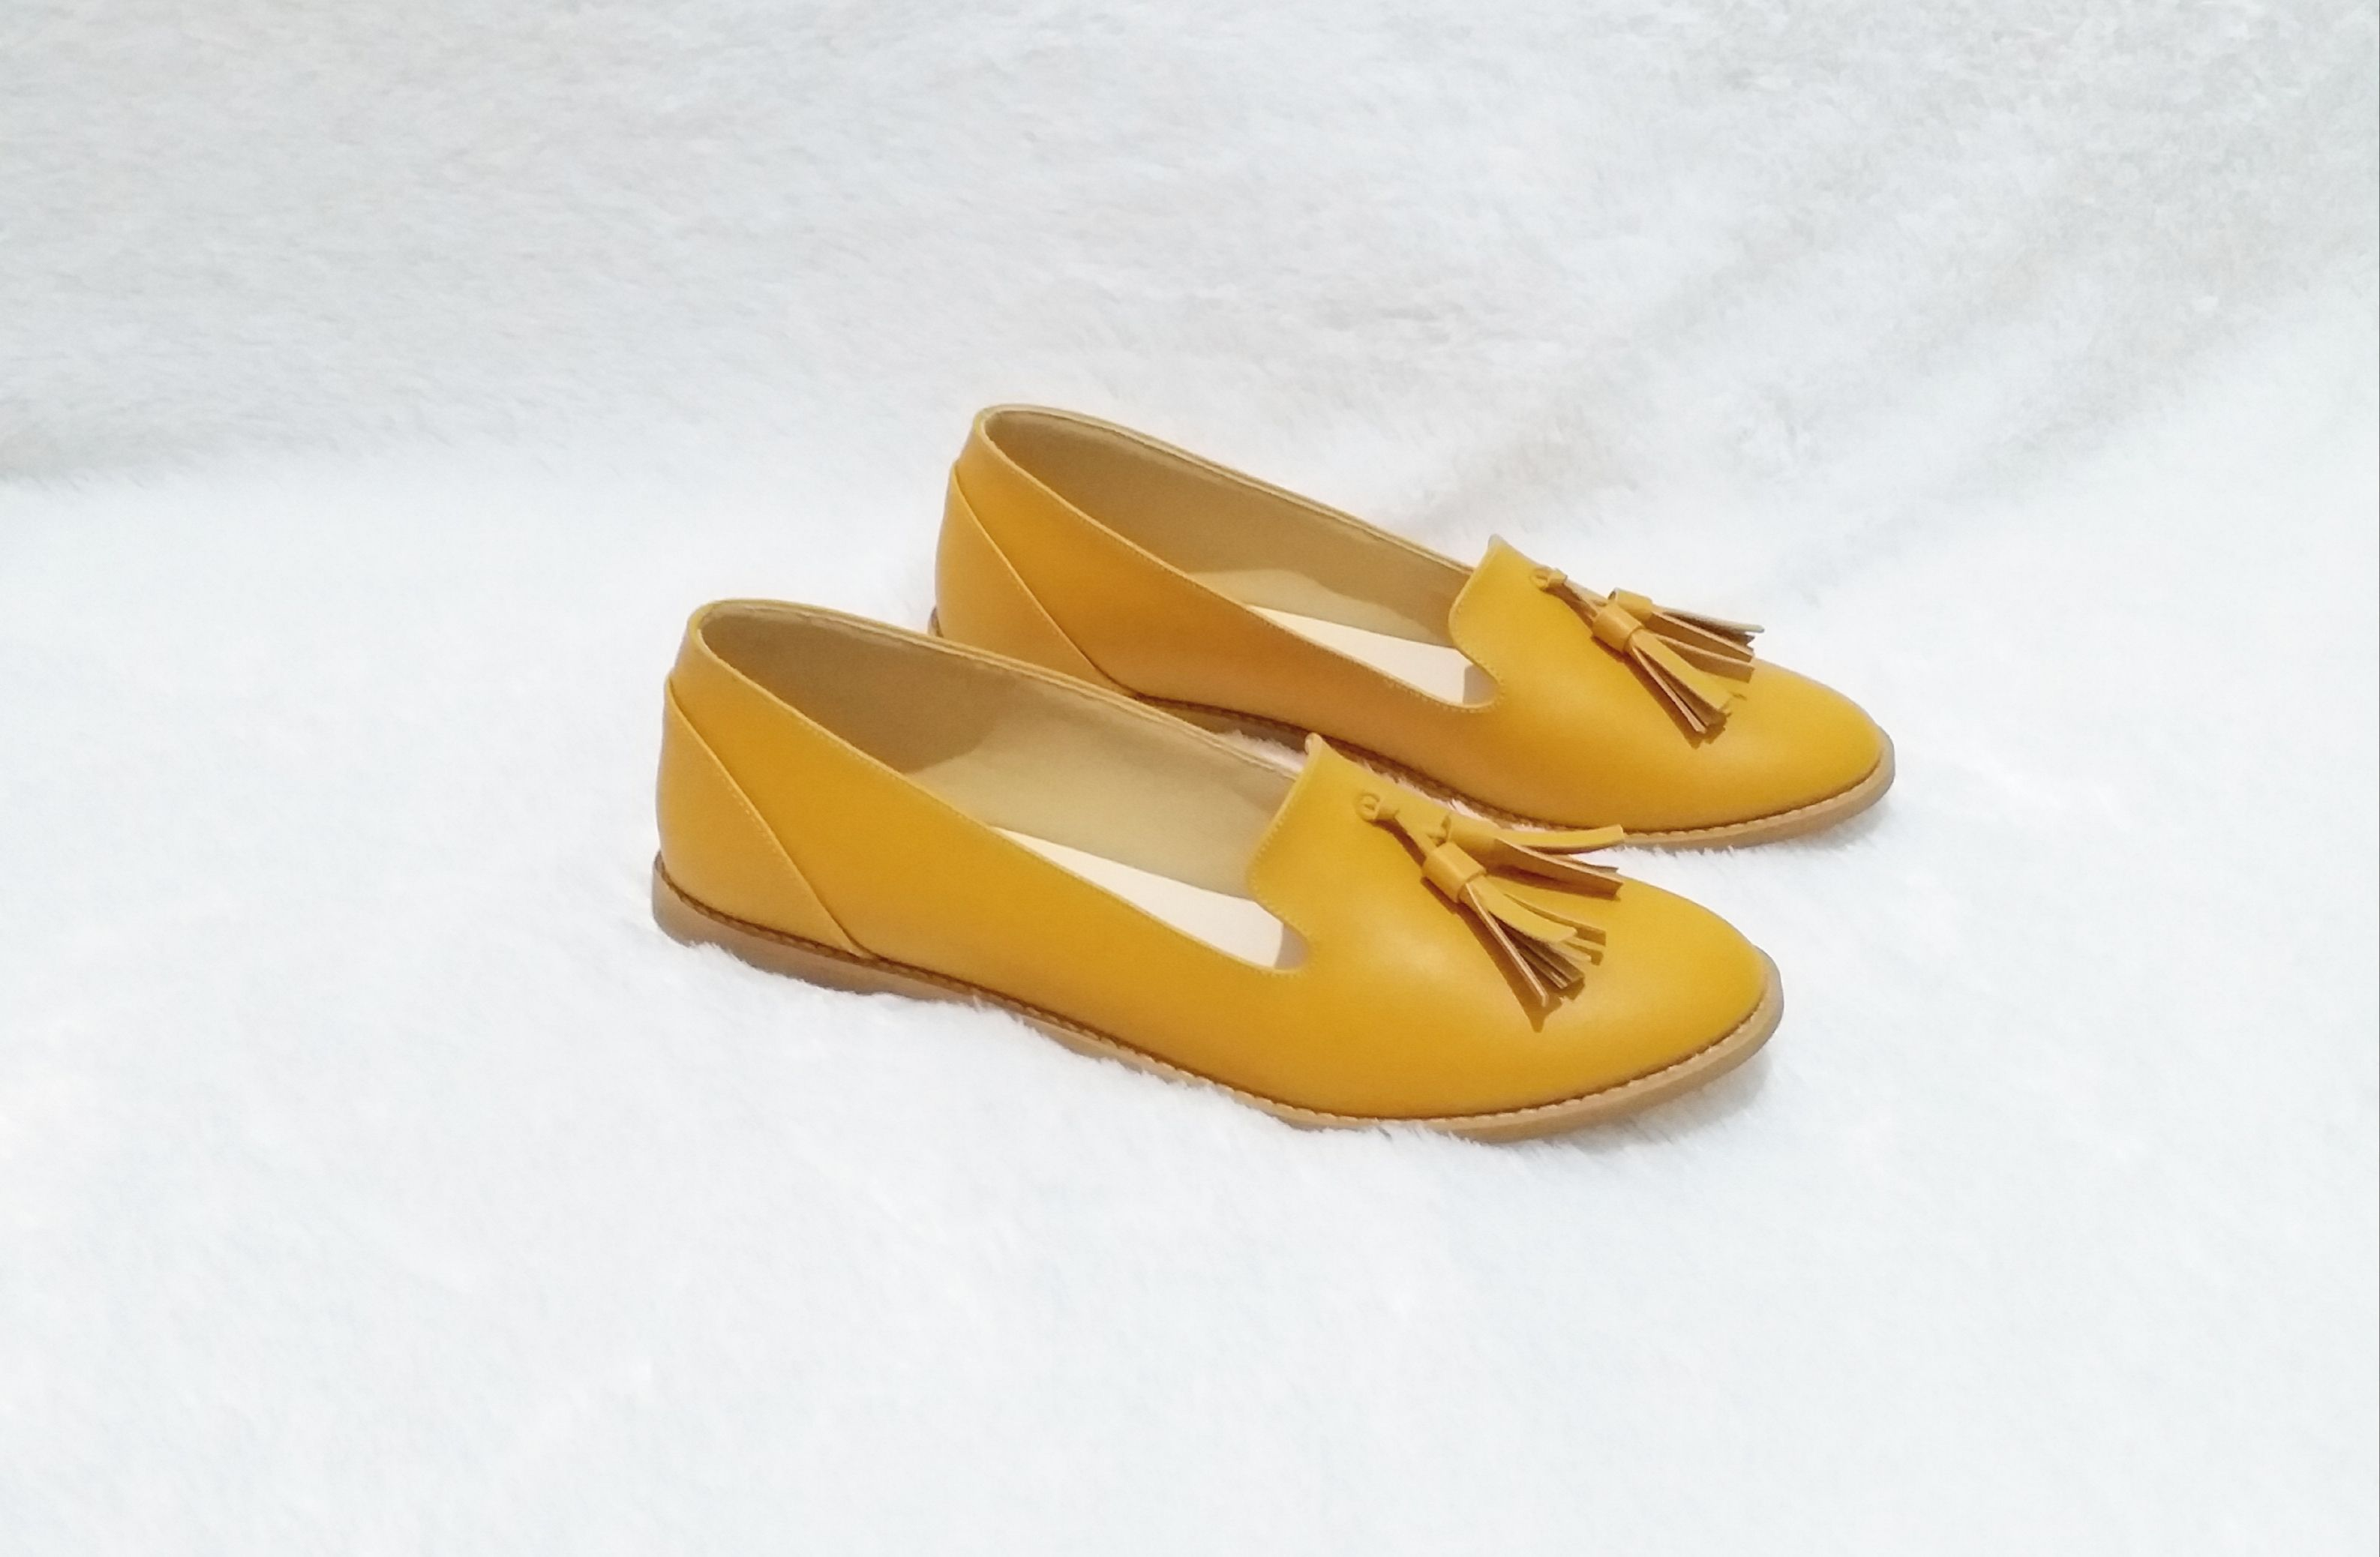 Terlaris Wa 62 813 9460 2818 Sepatu Wanita Terbaru Sepatu